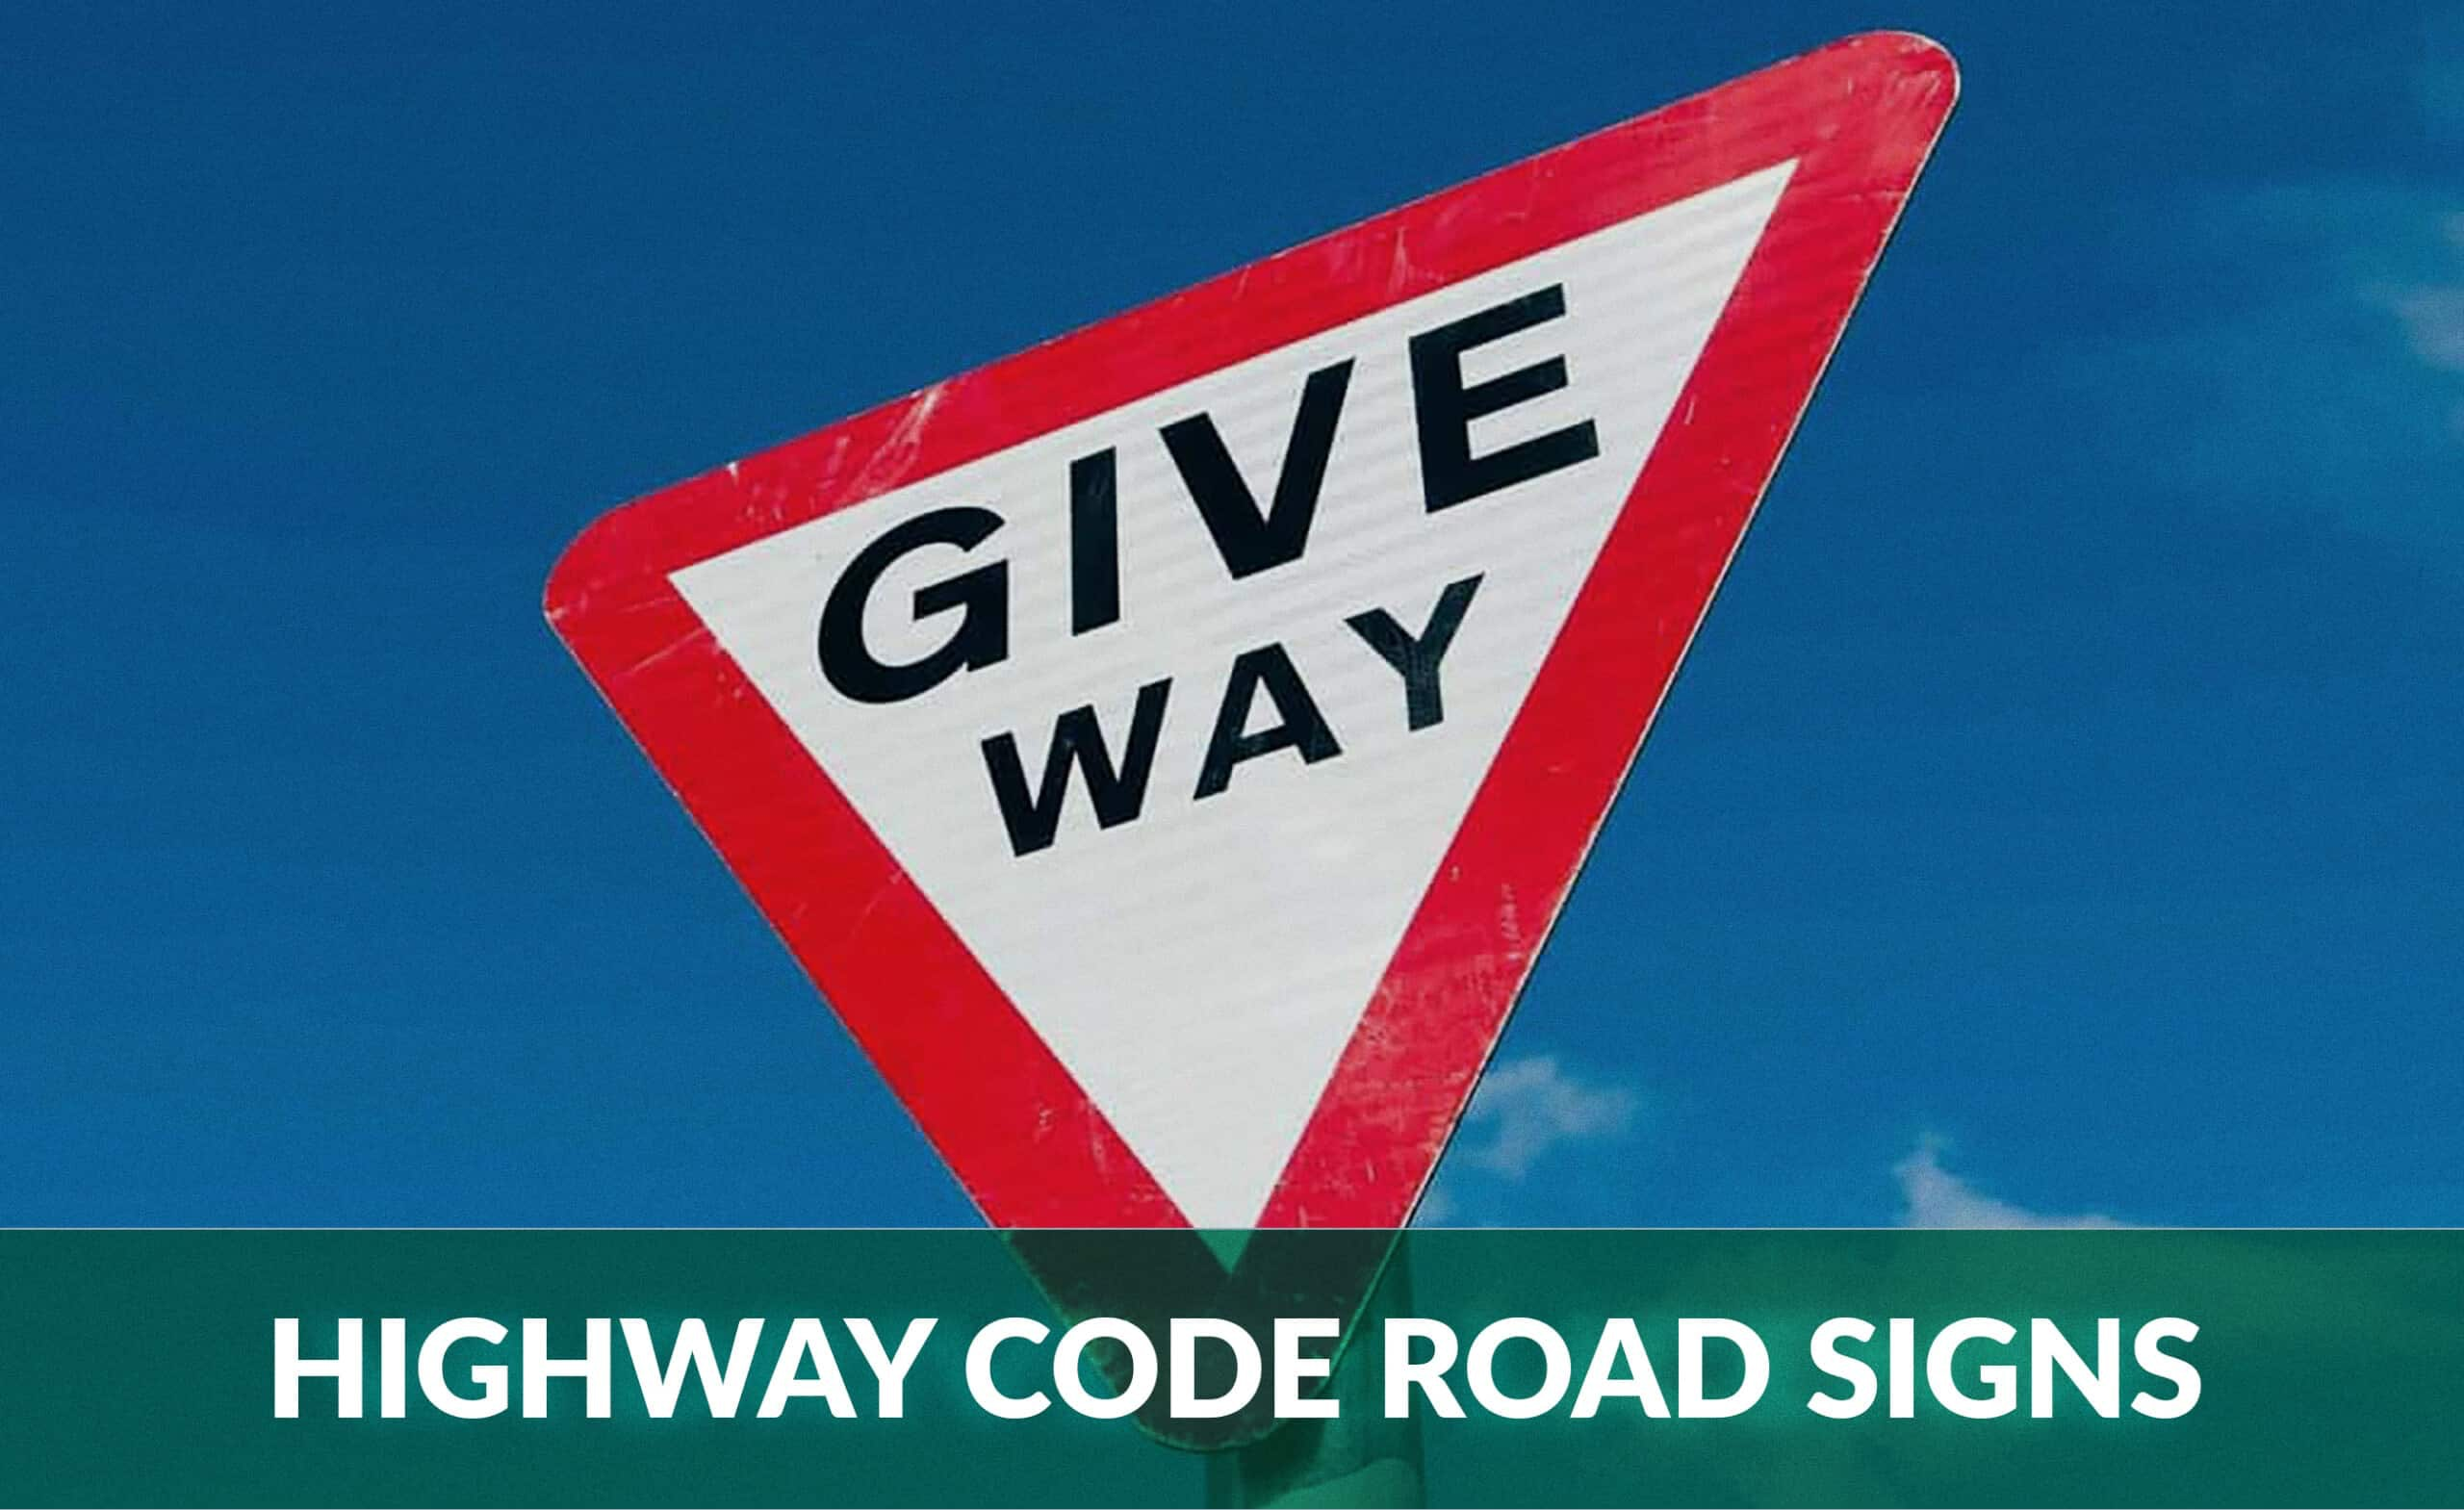 highway code road signs